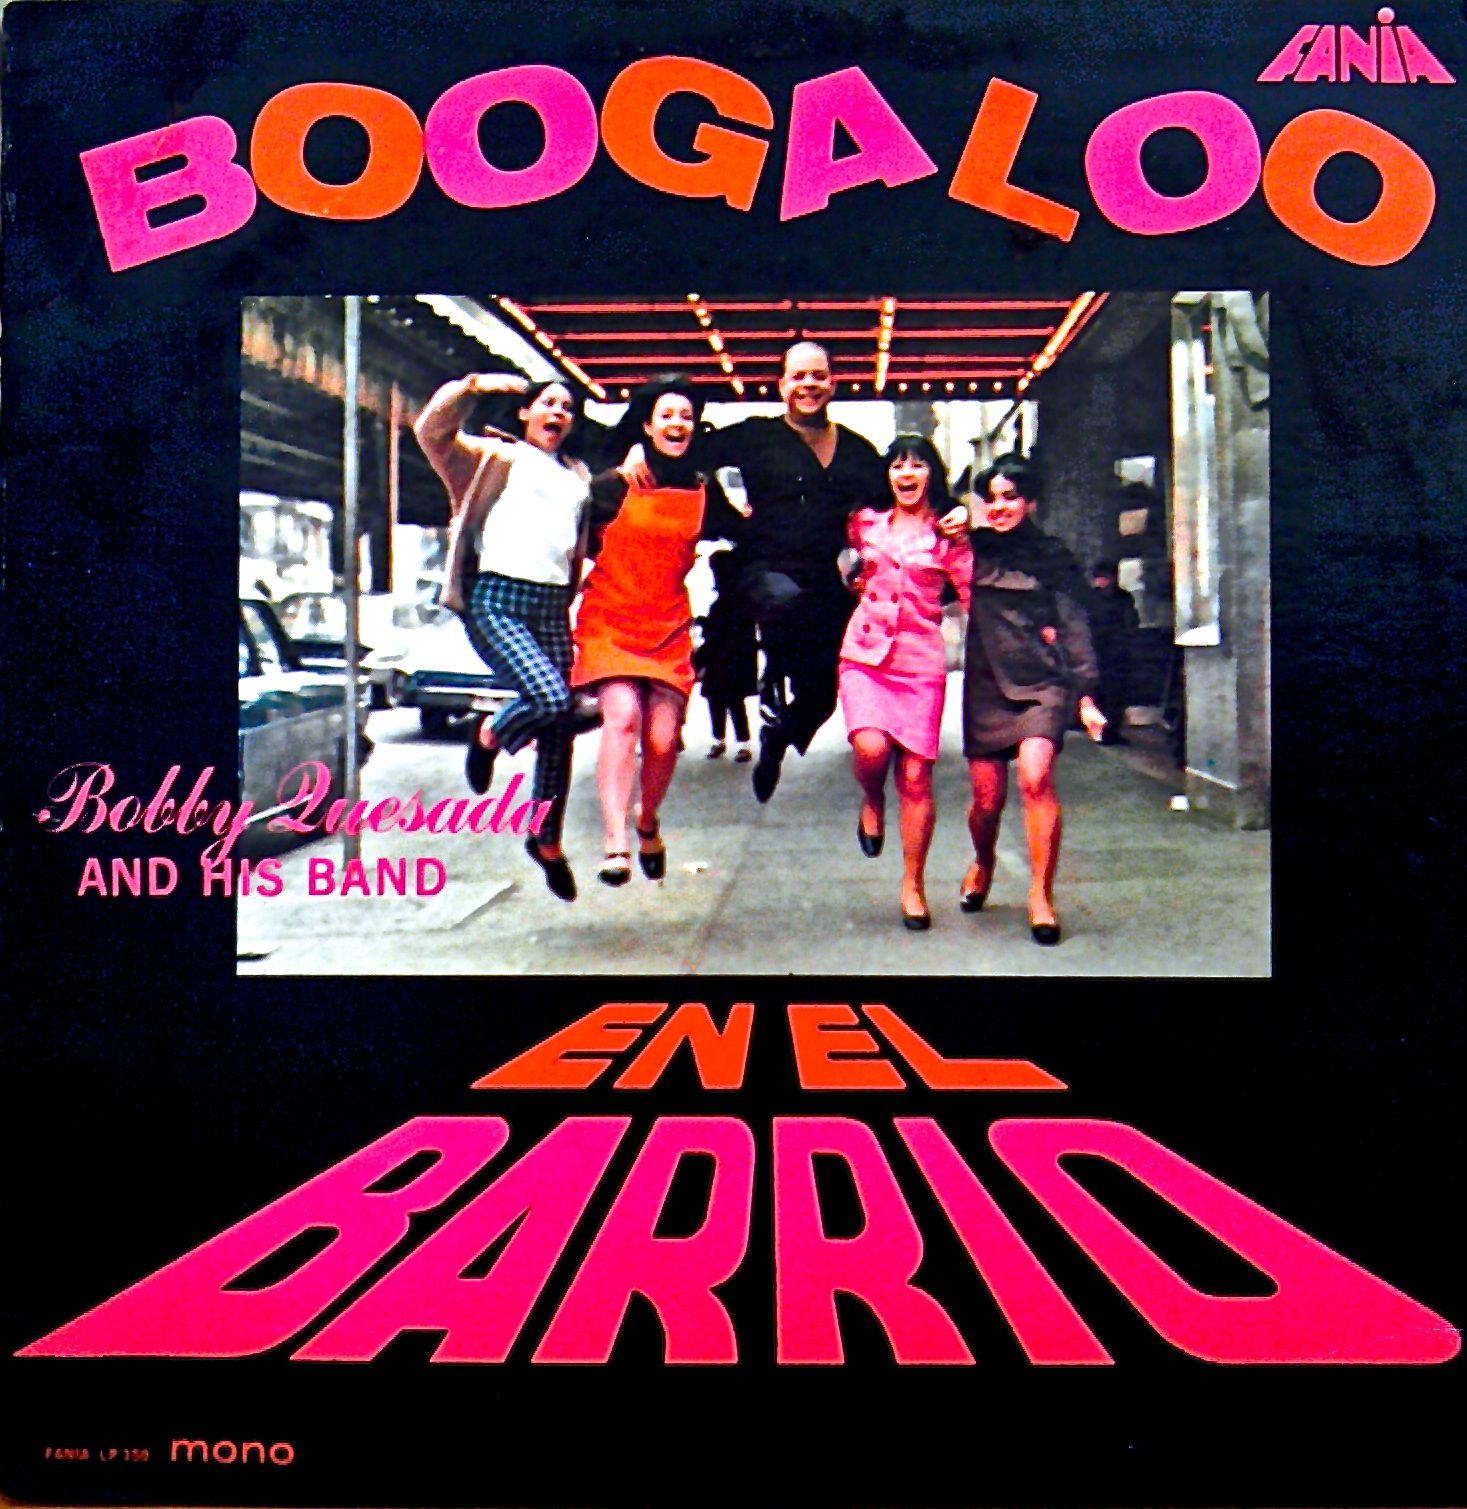 1969 Boogaloo En El Barrio / Bobby Quesada And His Orchestra  (Fania Records Gold Label Mono LP-350)